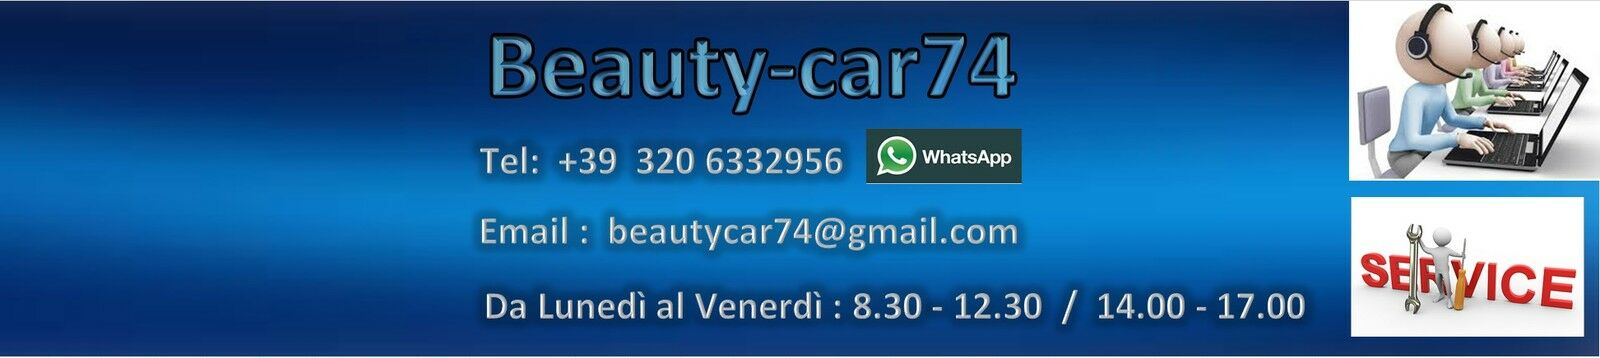 Beauty-car74